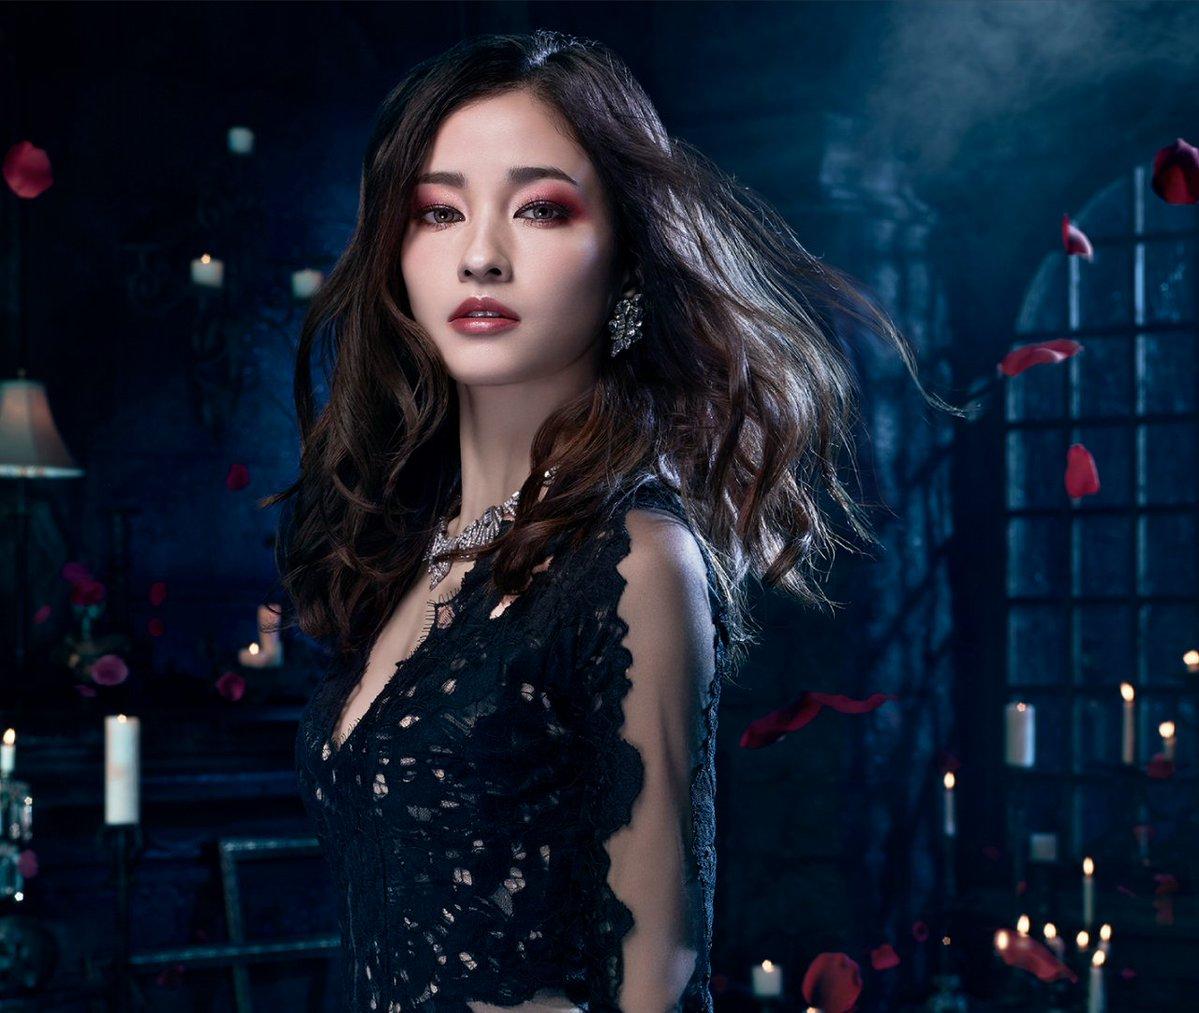 Random Roundup: Jisoo knows she cute, Yubin & Sori dance ...